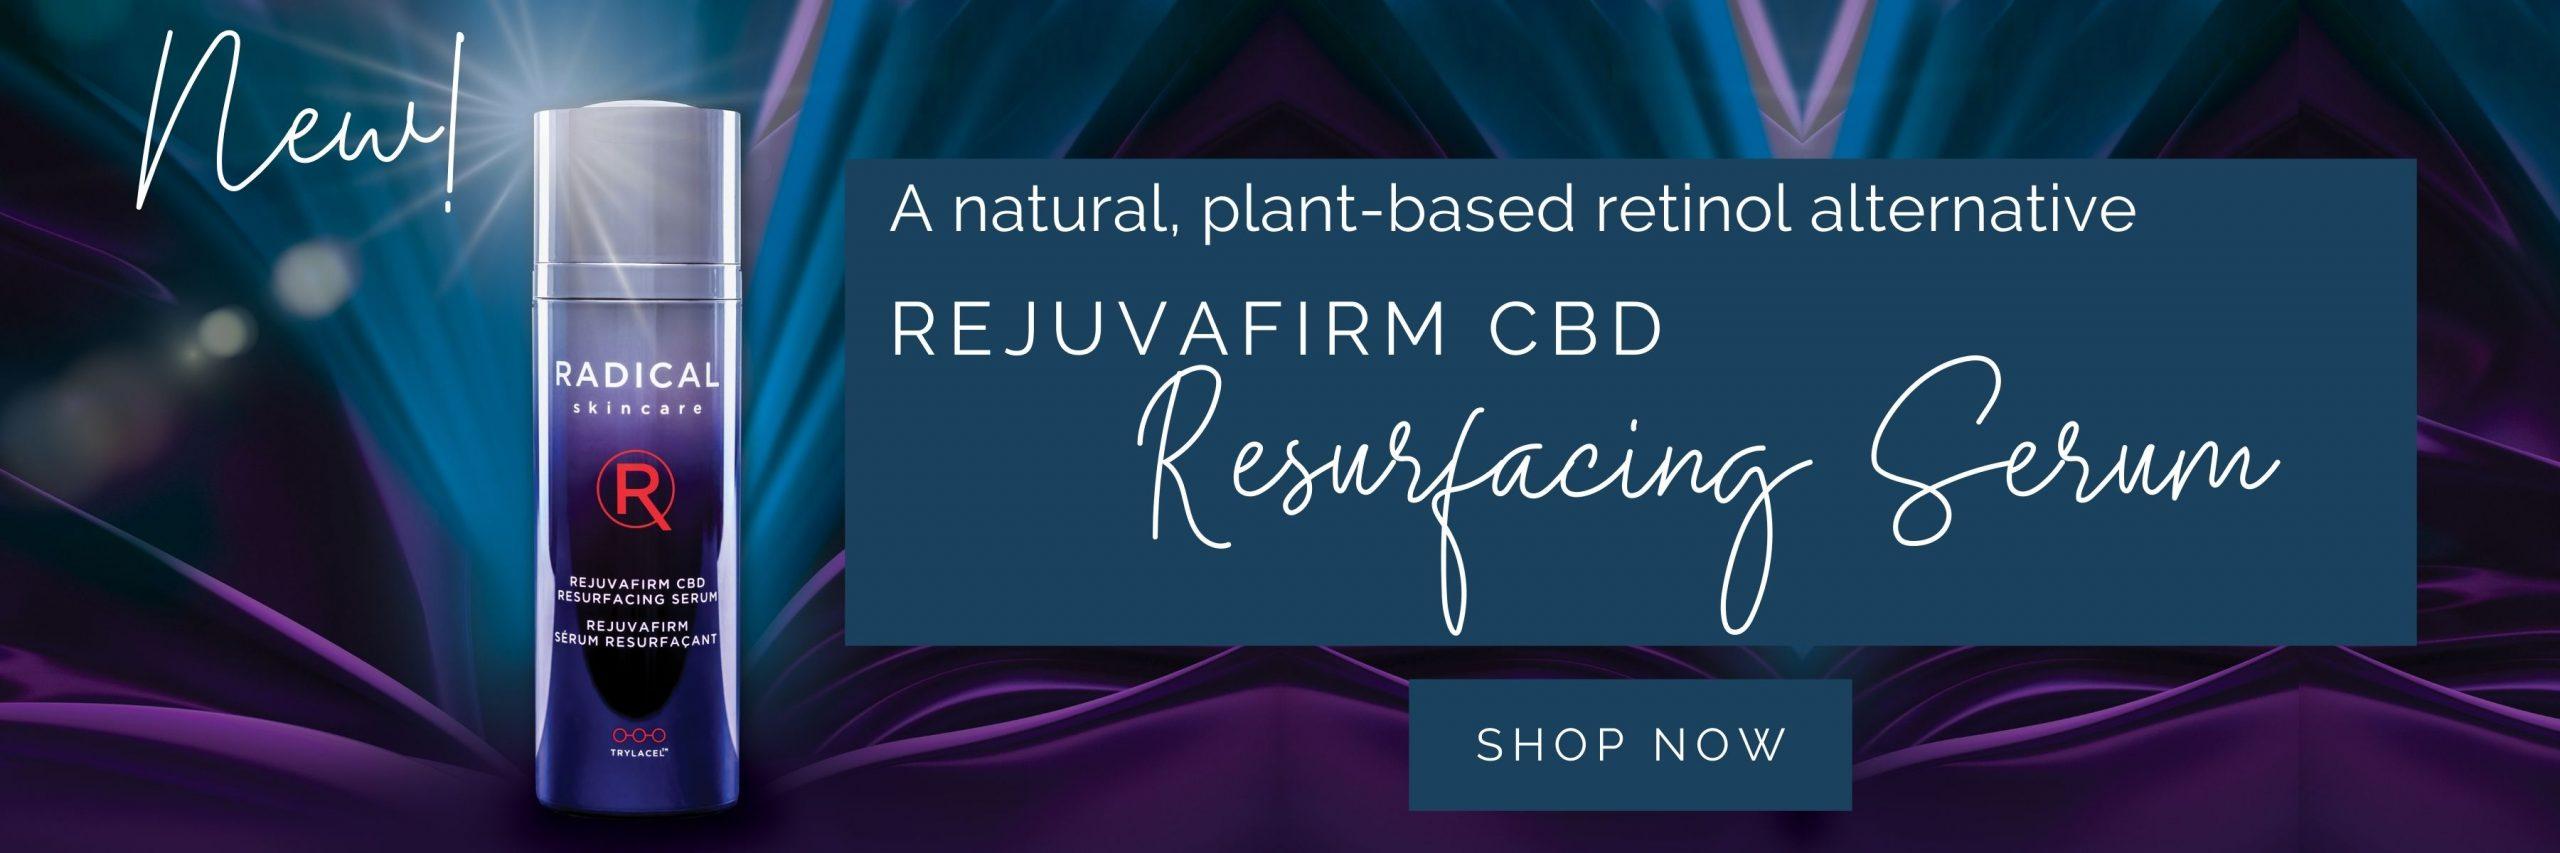 rejuvafirm cbd resurfacing serum banner